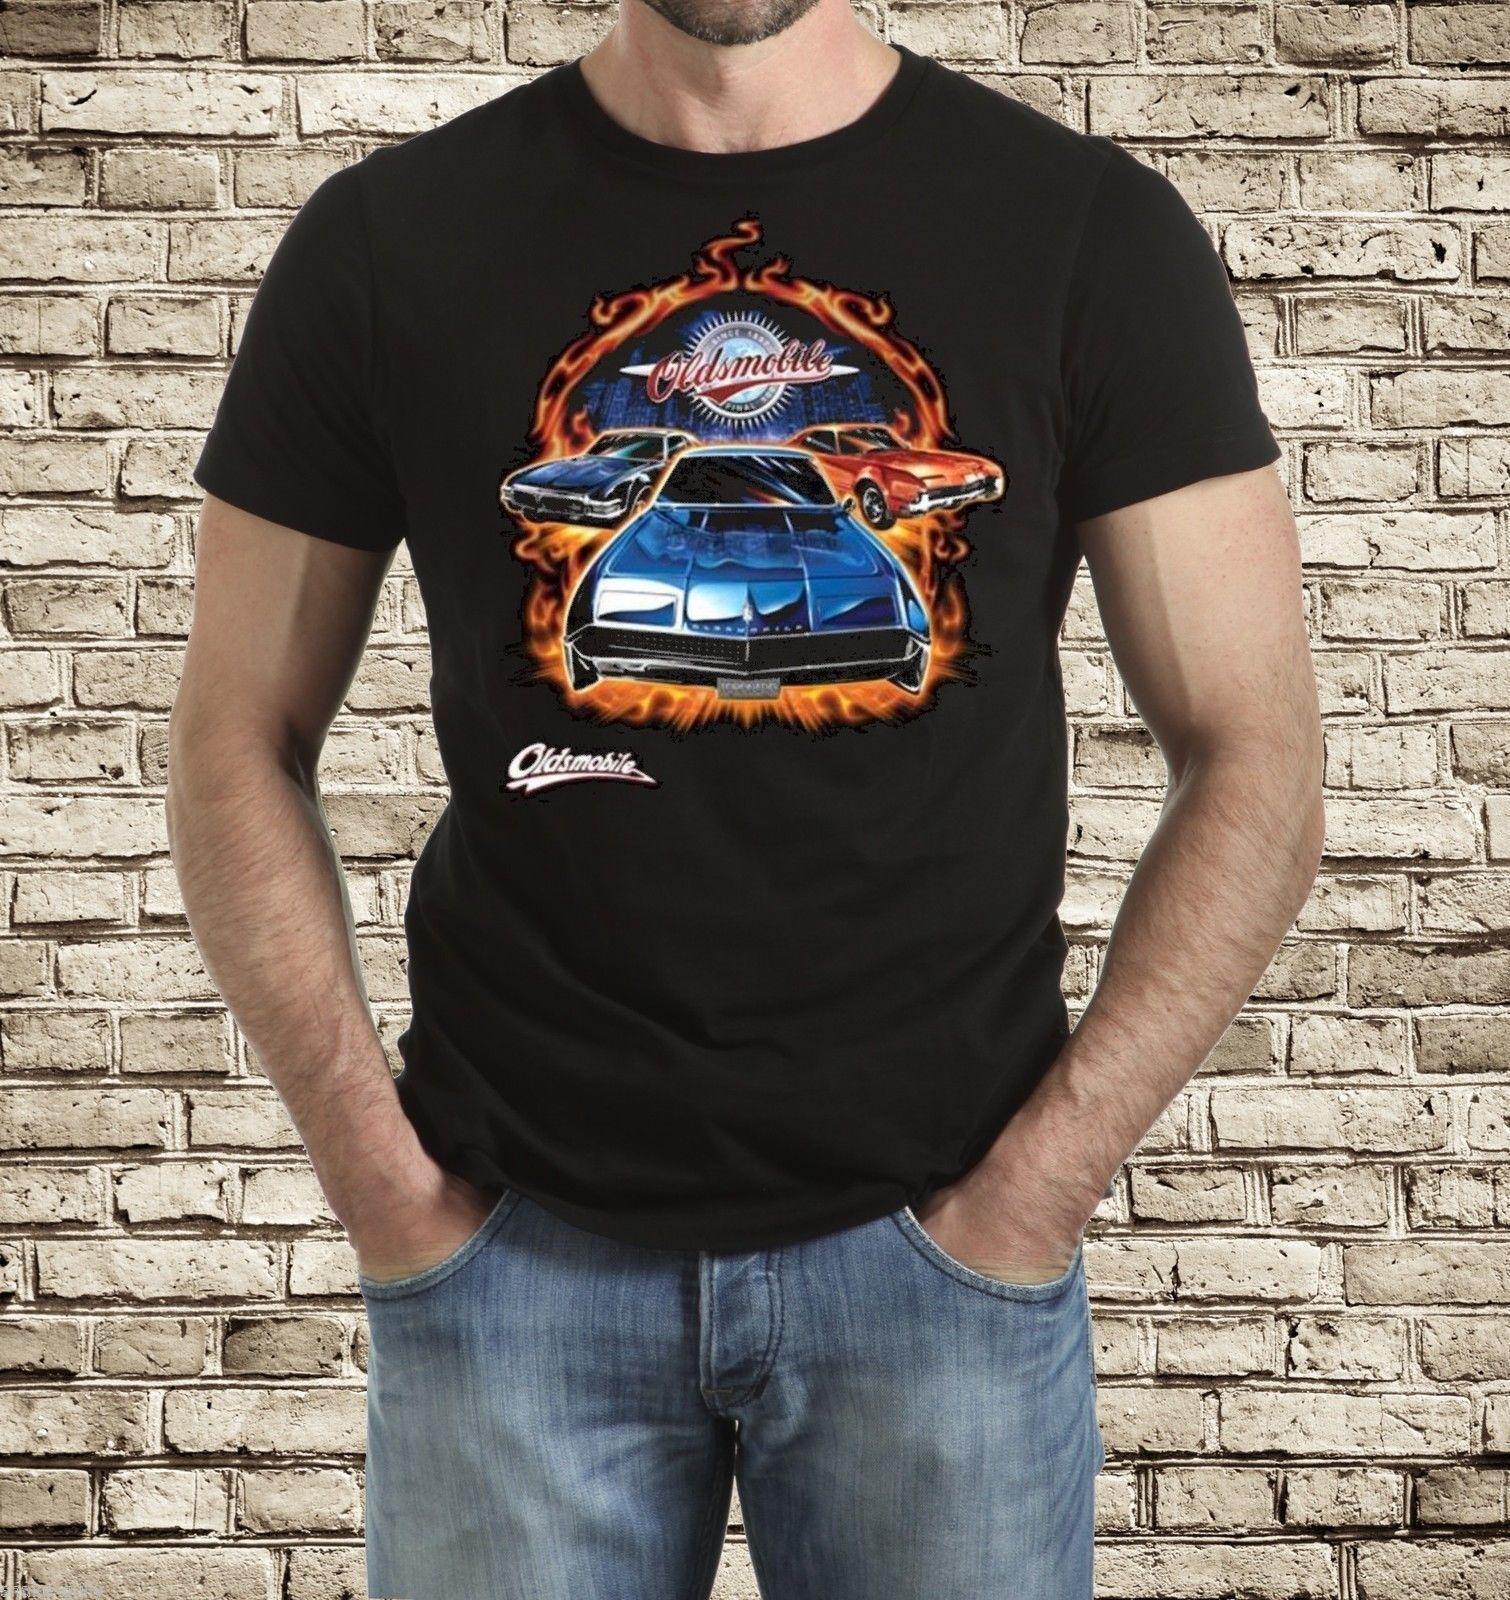 Oldsmobile T Shirt T Shirts Design Designer T Shirts From